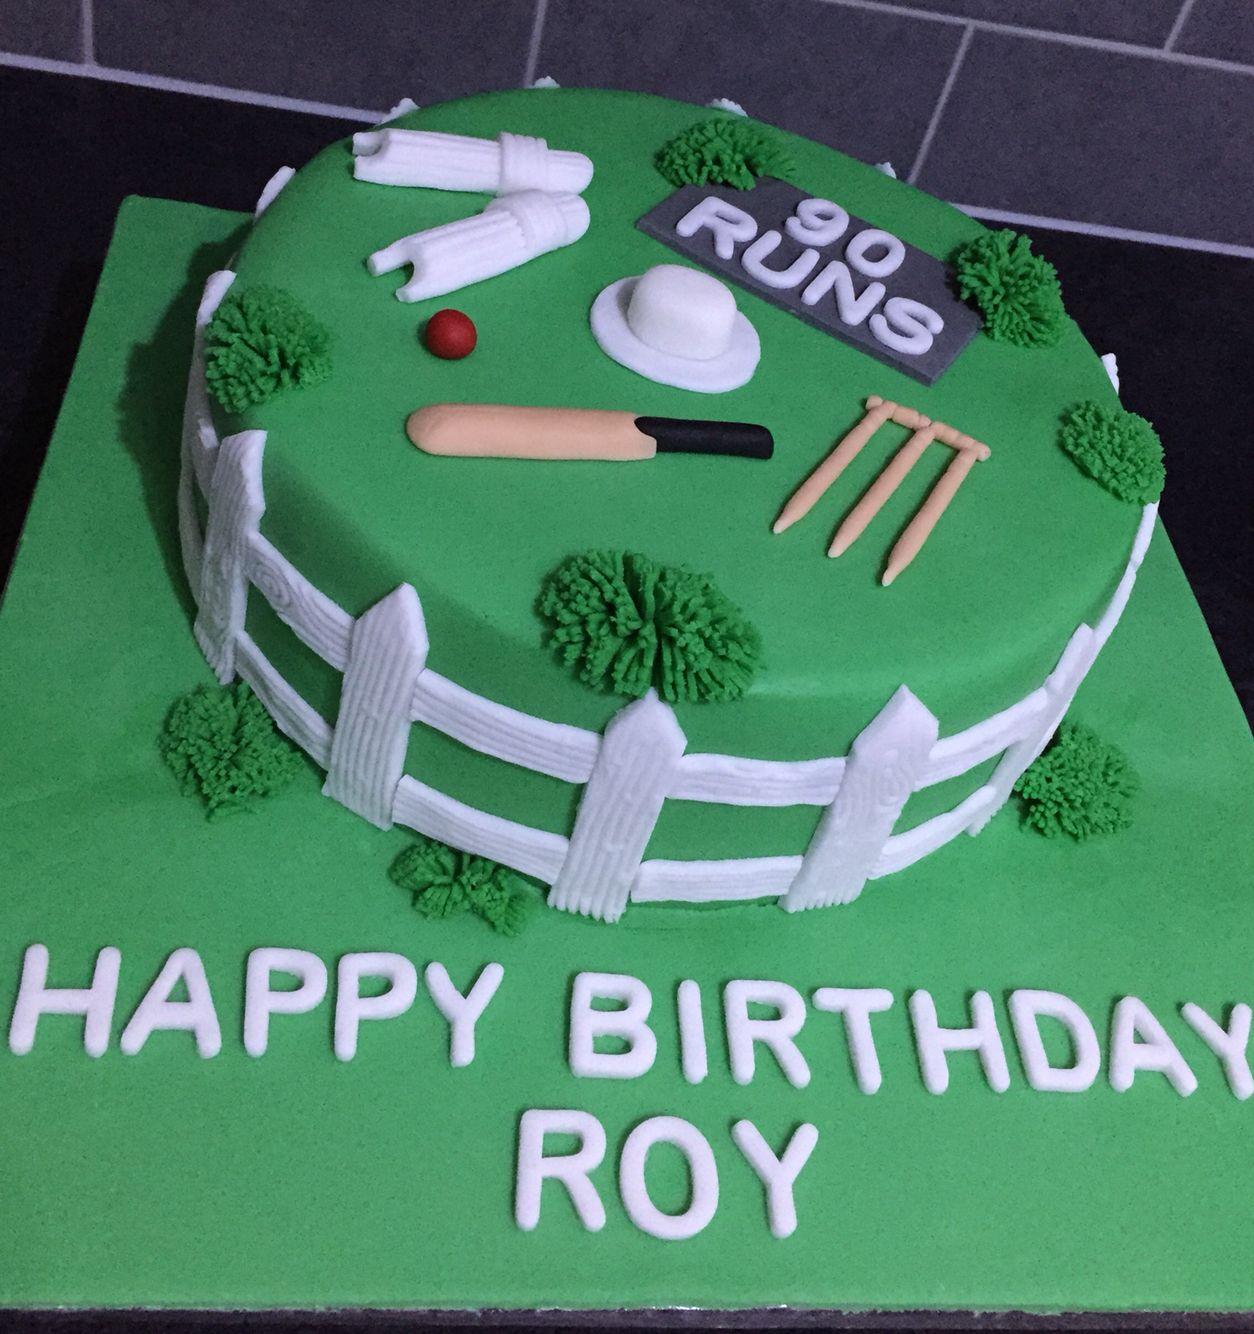 Cricket Cake Cricket Birthday Cake Cricket Cake Birthday Cake For Him